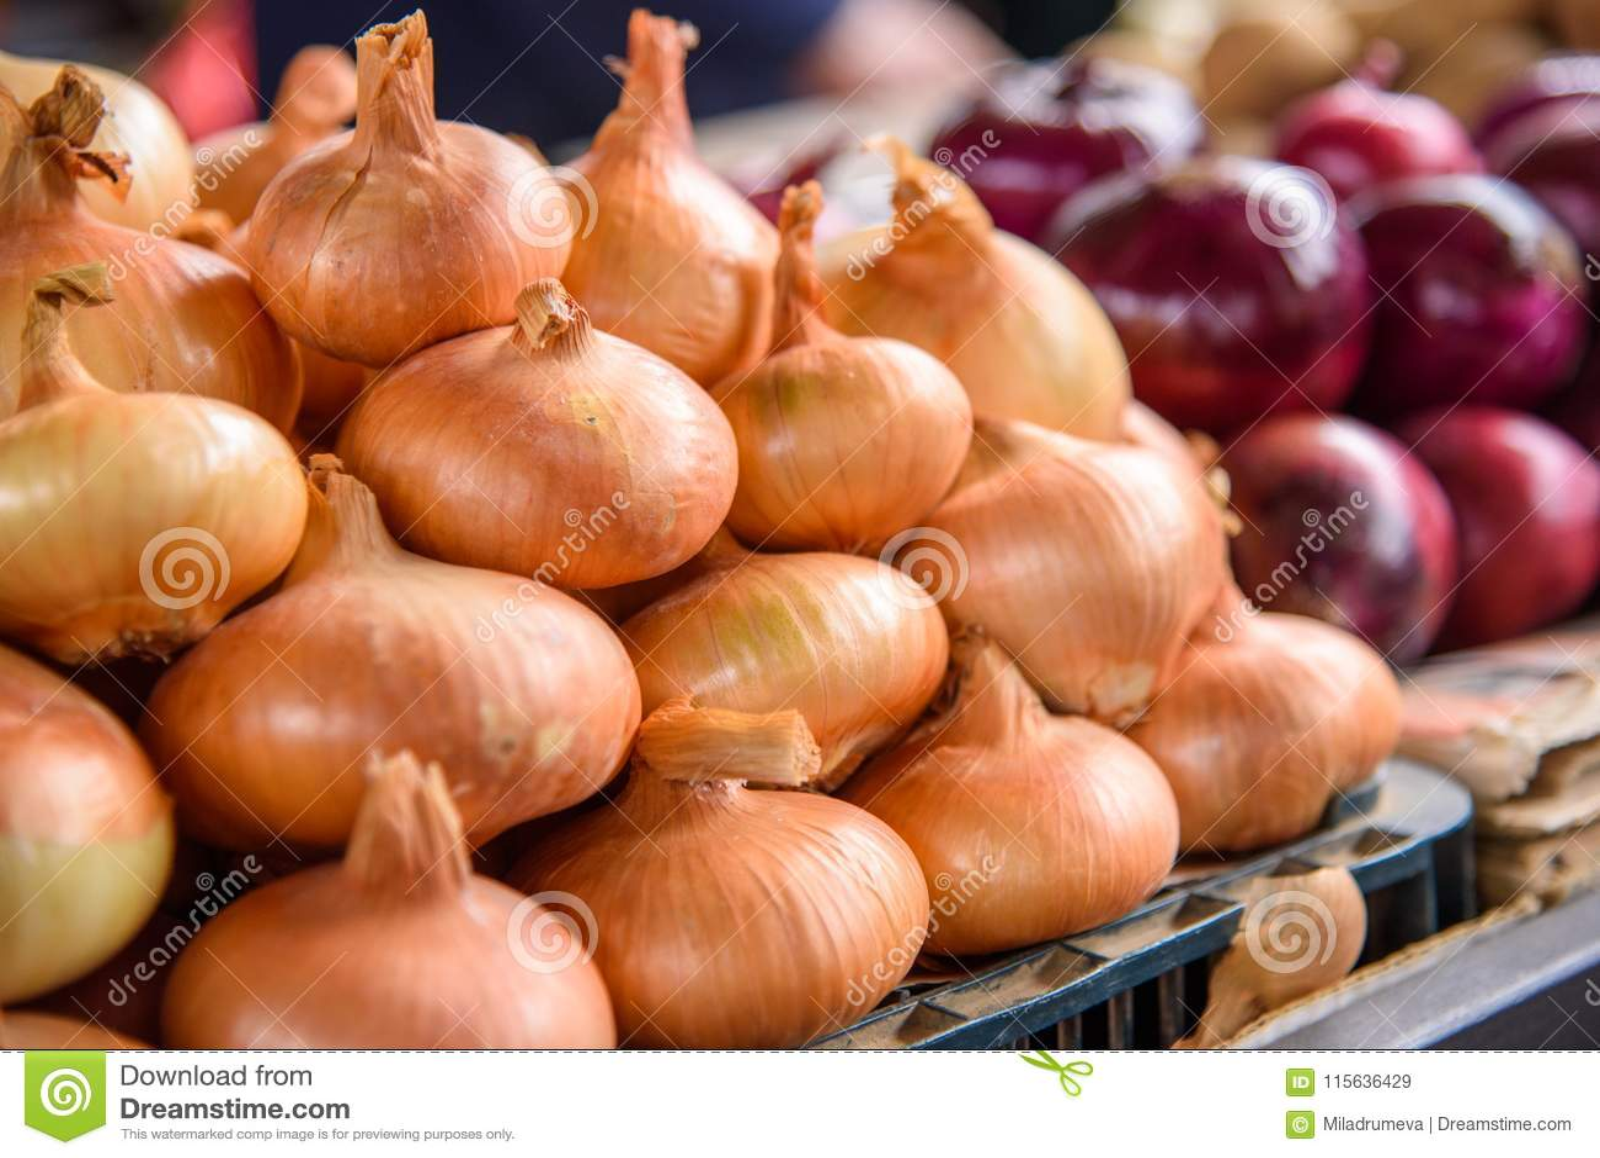 Fresh onion at the market